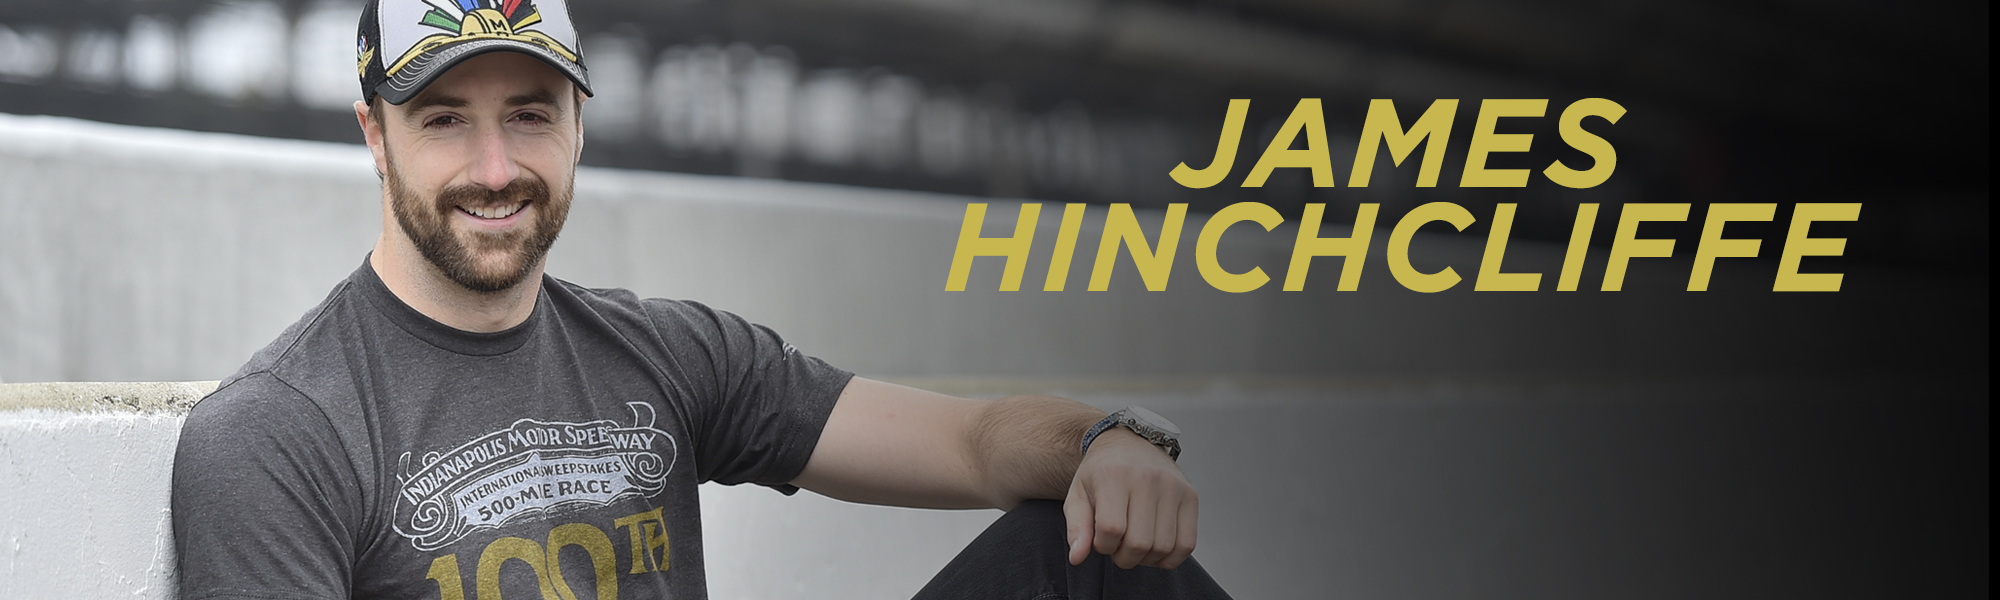 driver-banner-hinchcliffe2.jpg